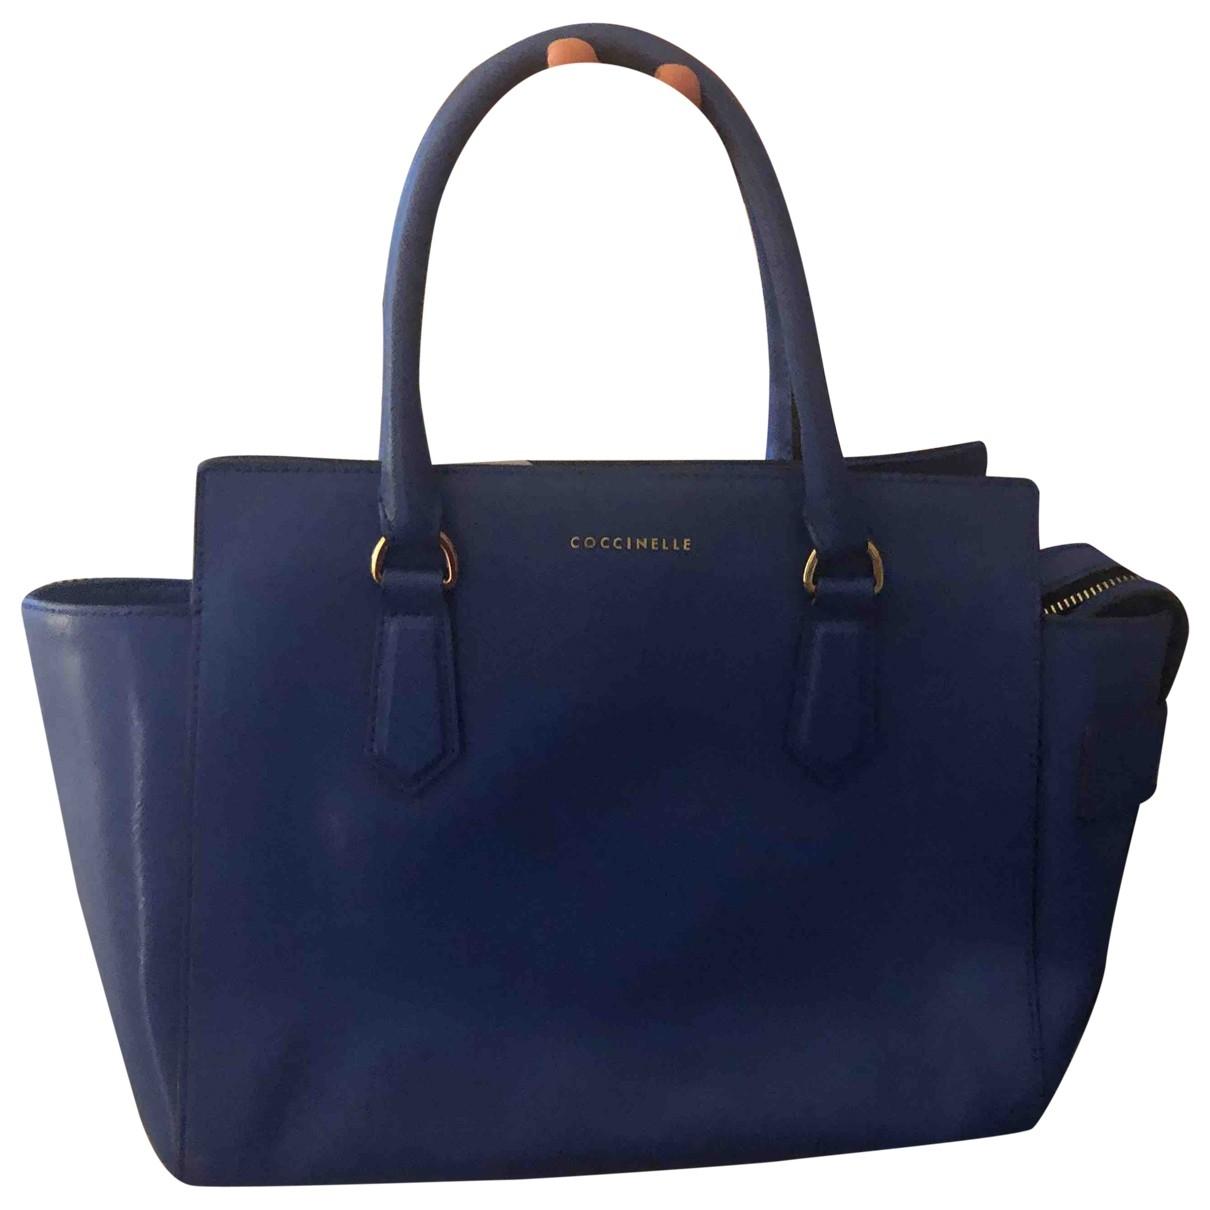 Coccinelle \N Blue Leather handbag for Women \N